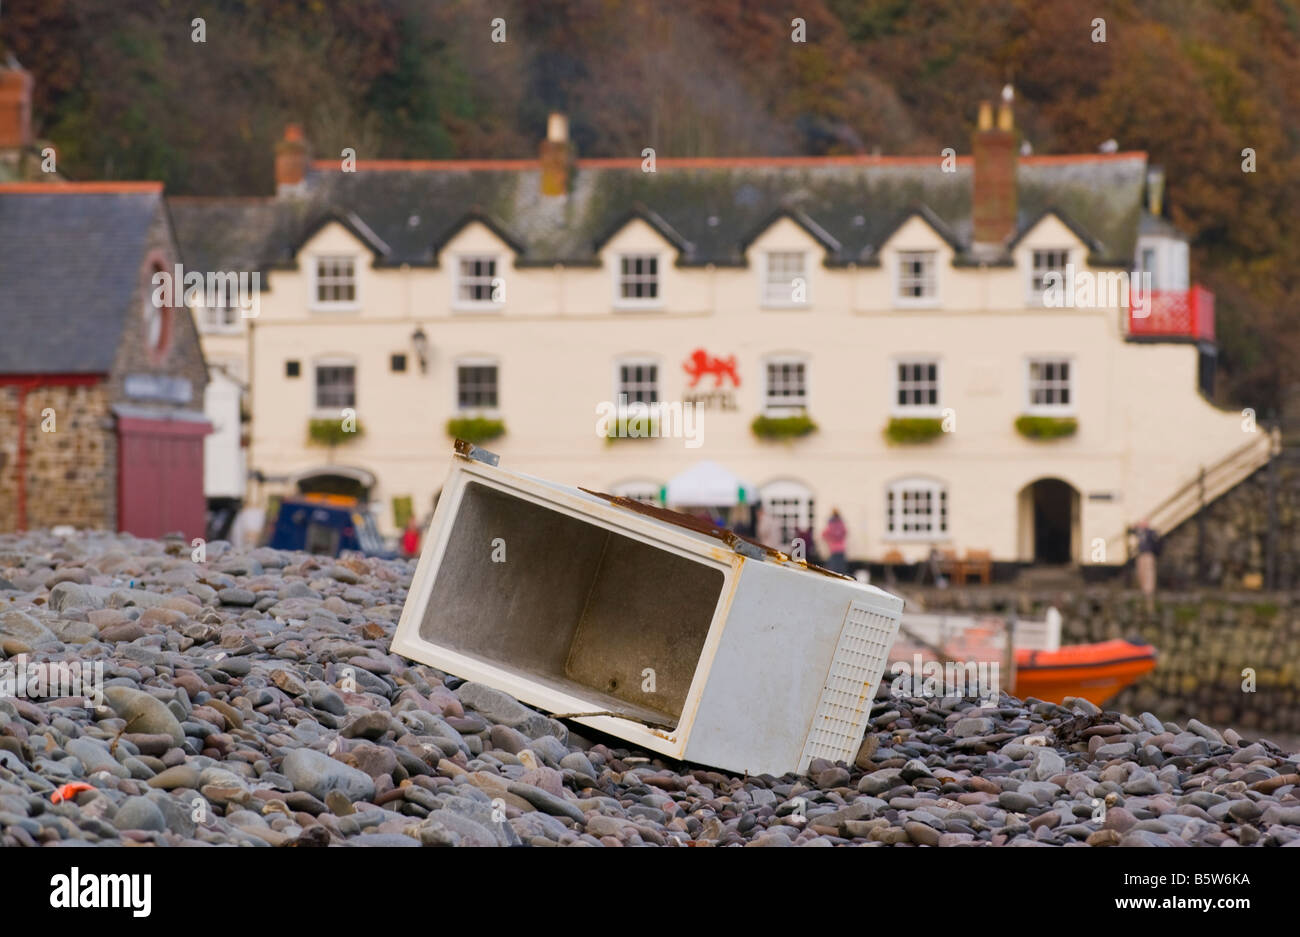 Freezer washed up on pebble beach in the coastal village of Clovelly North Devon England UK - Stock Image